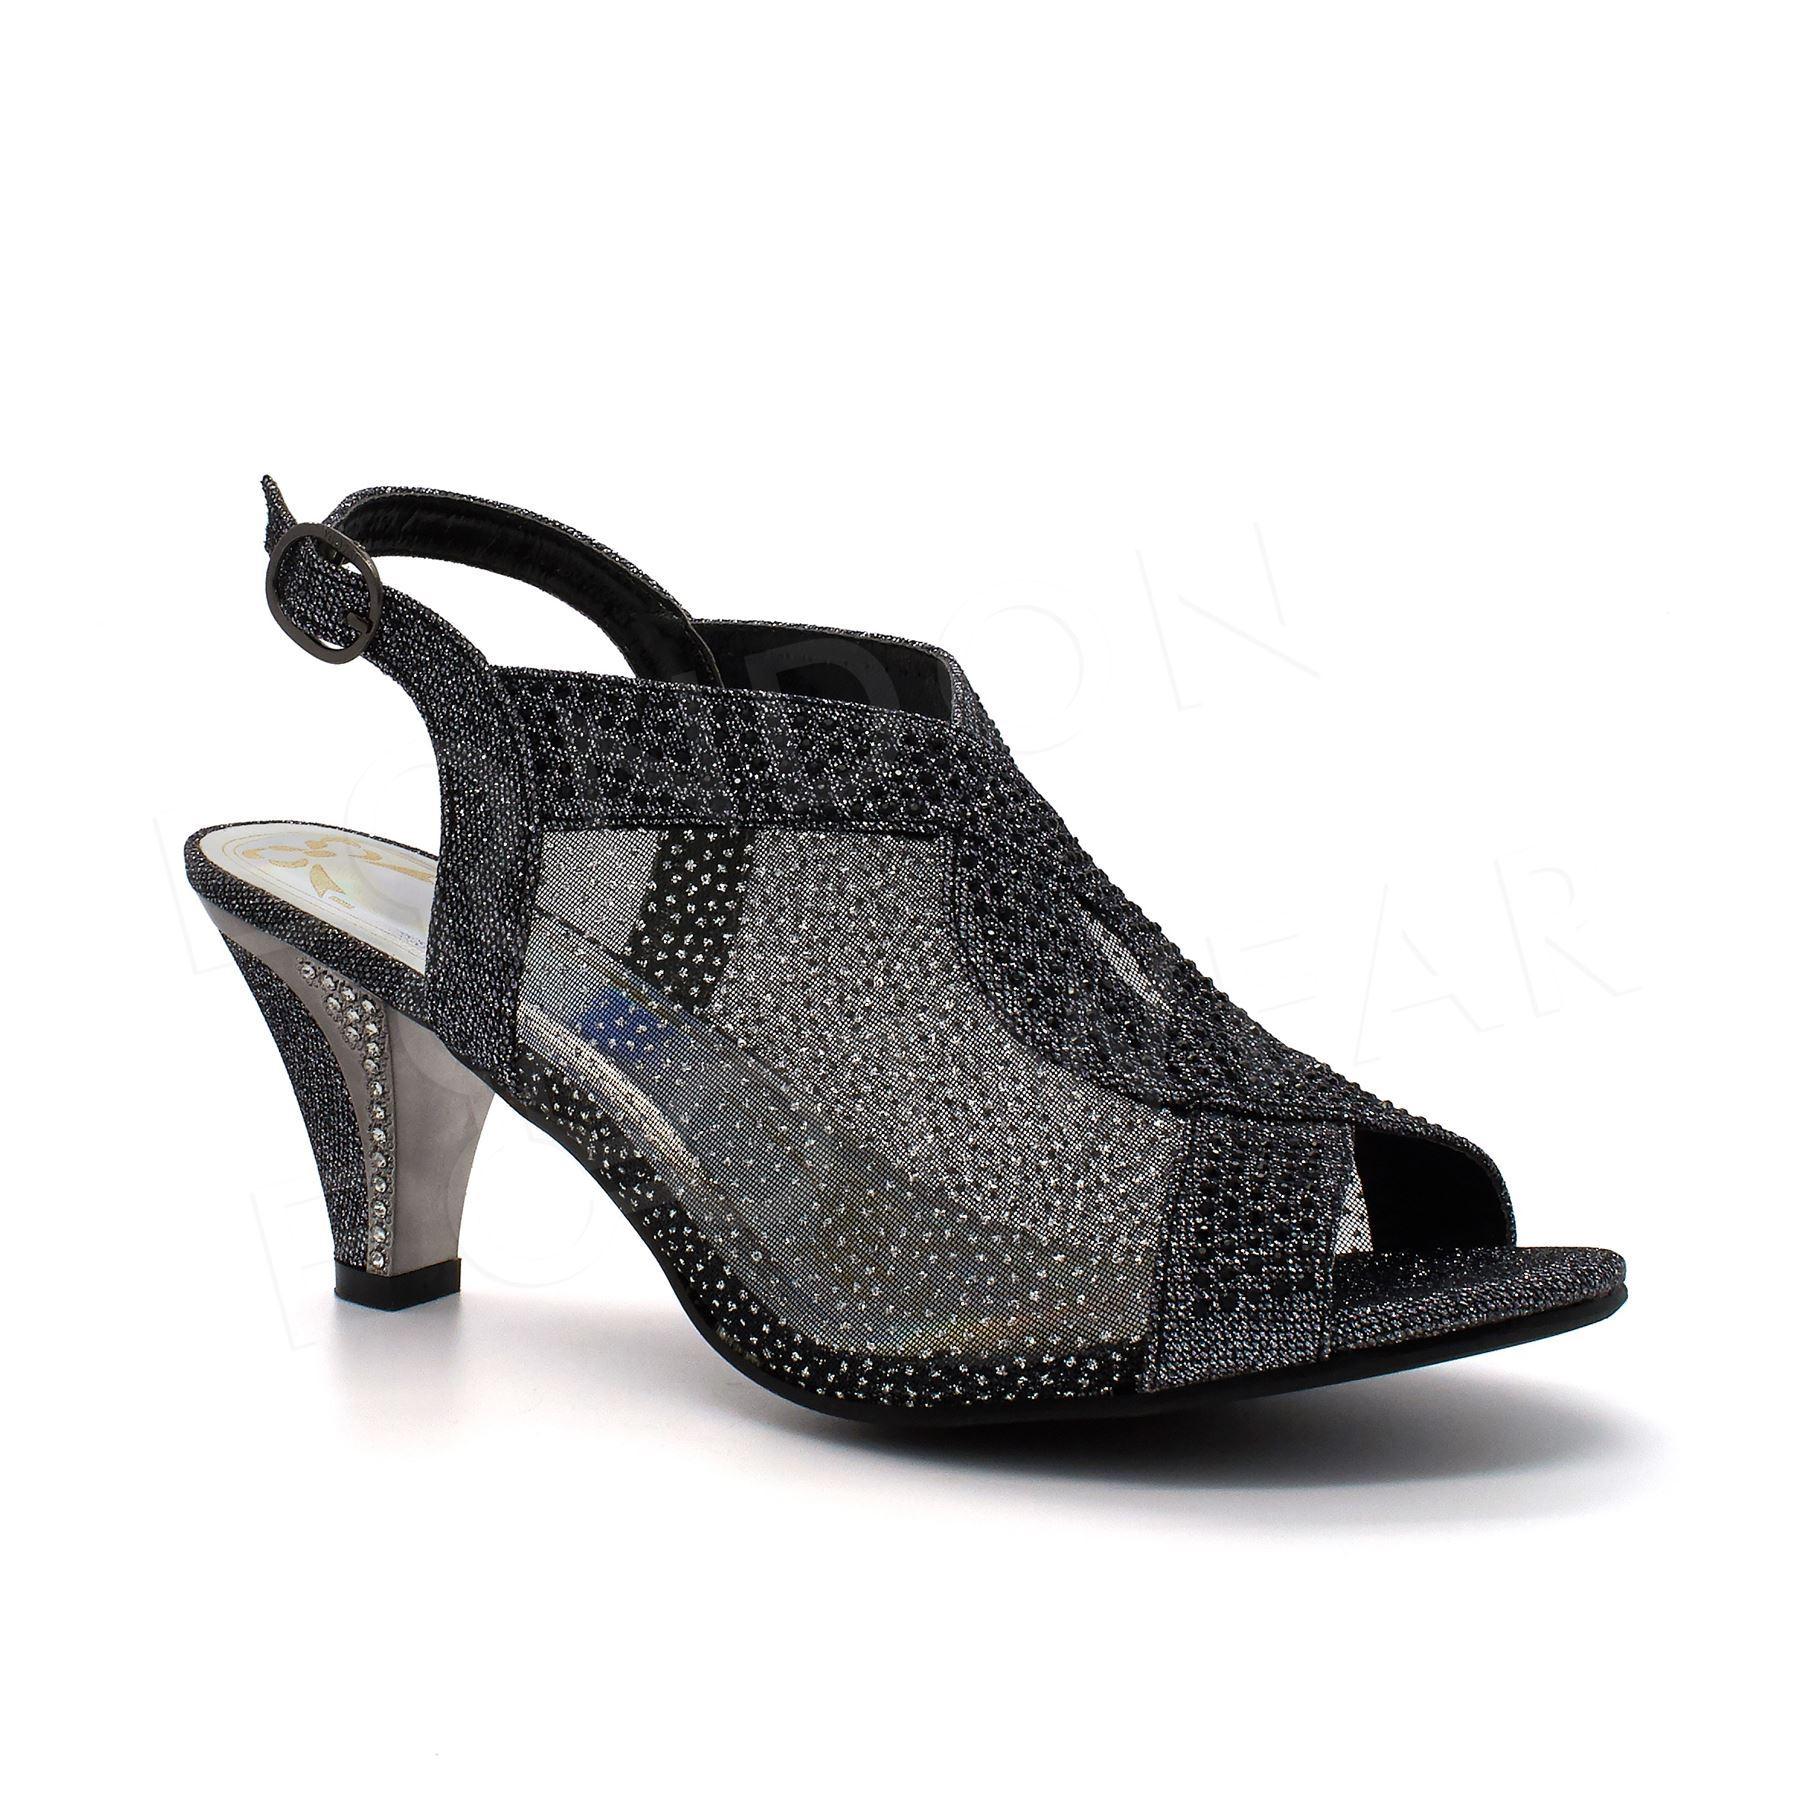 womens diamante glitter evening shoes mid heel